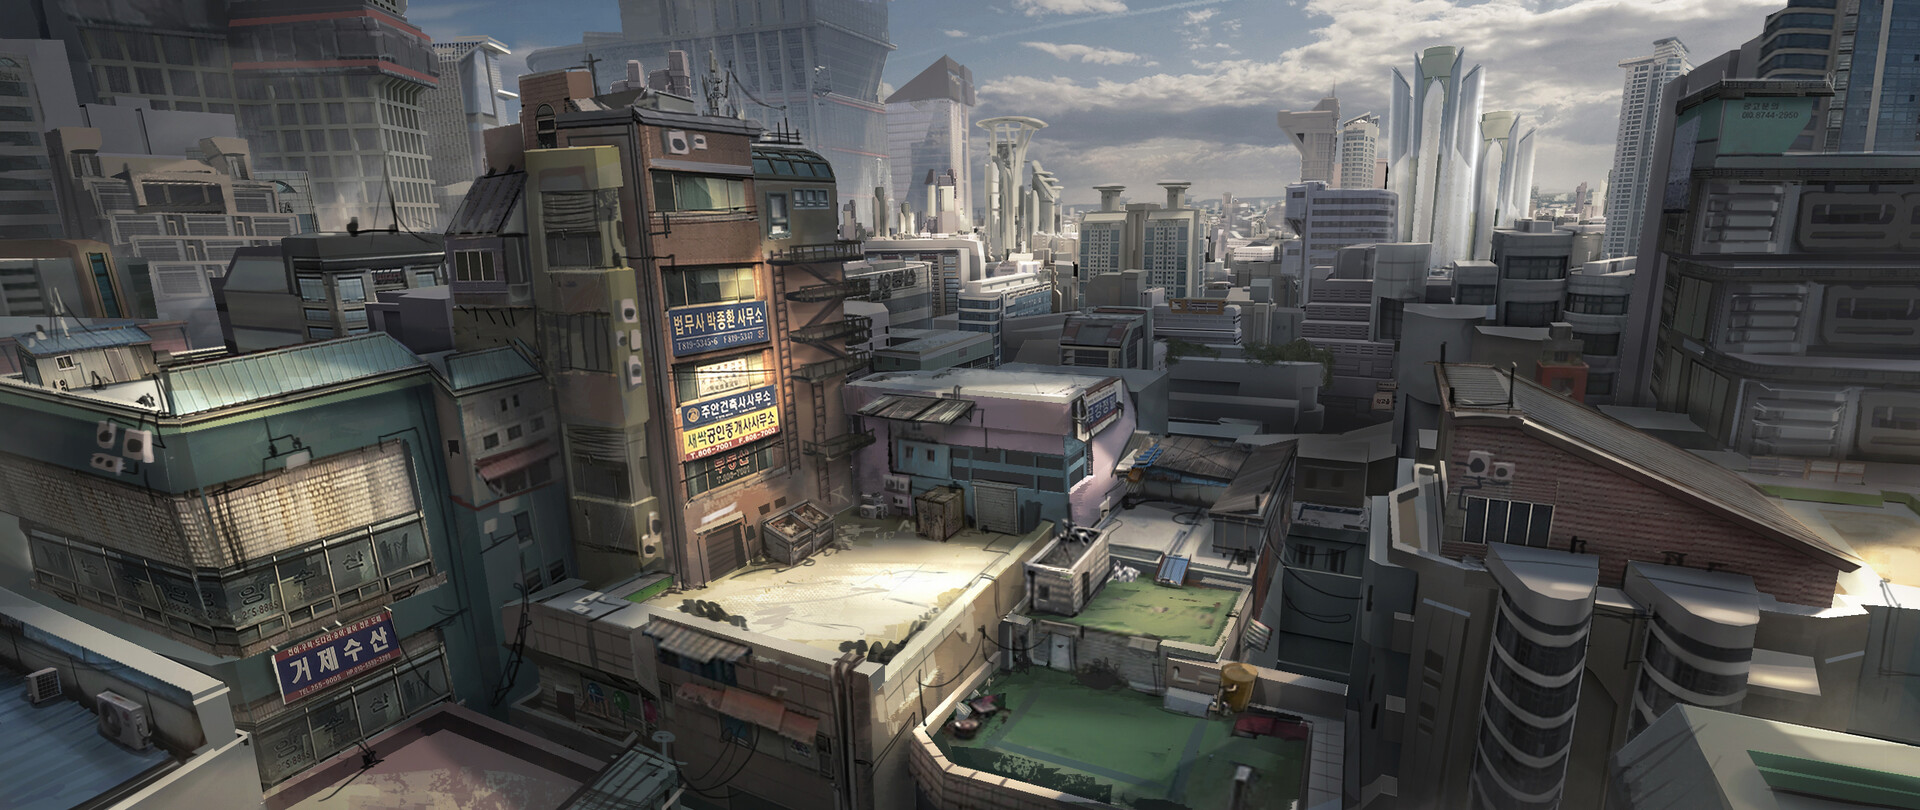 Robin lhebrard city concept5